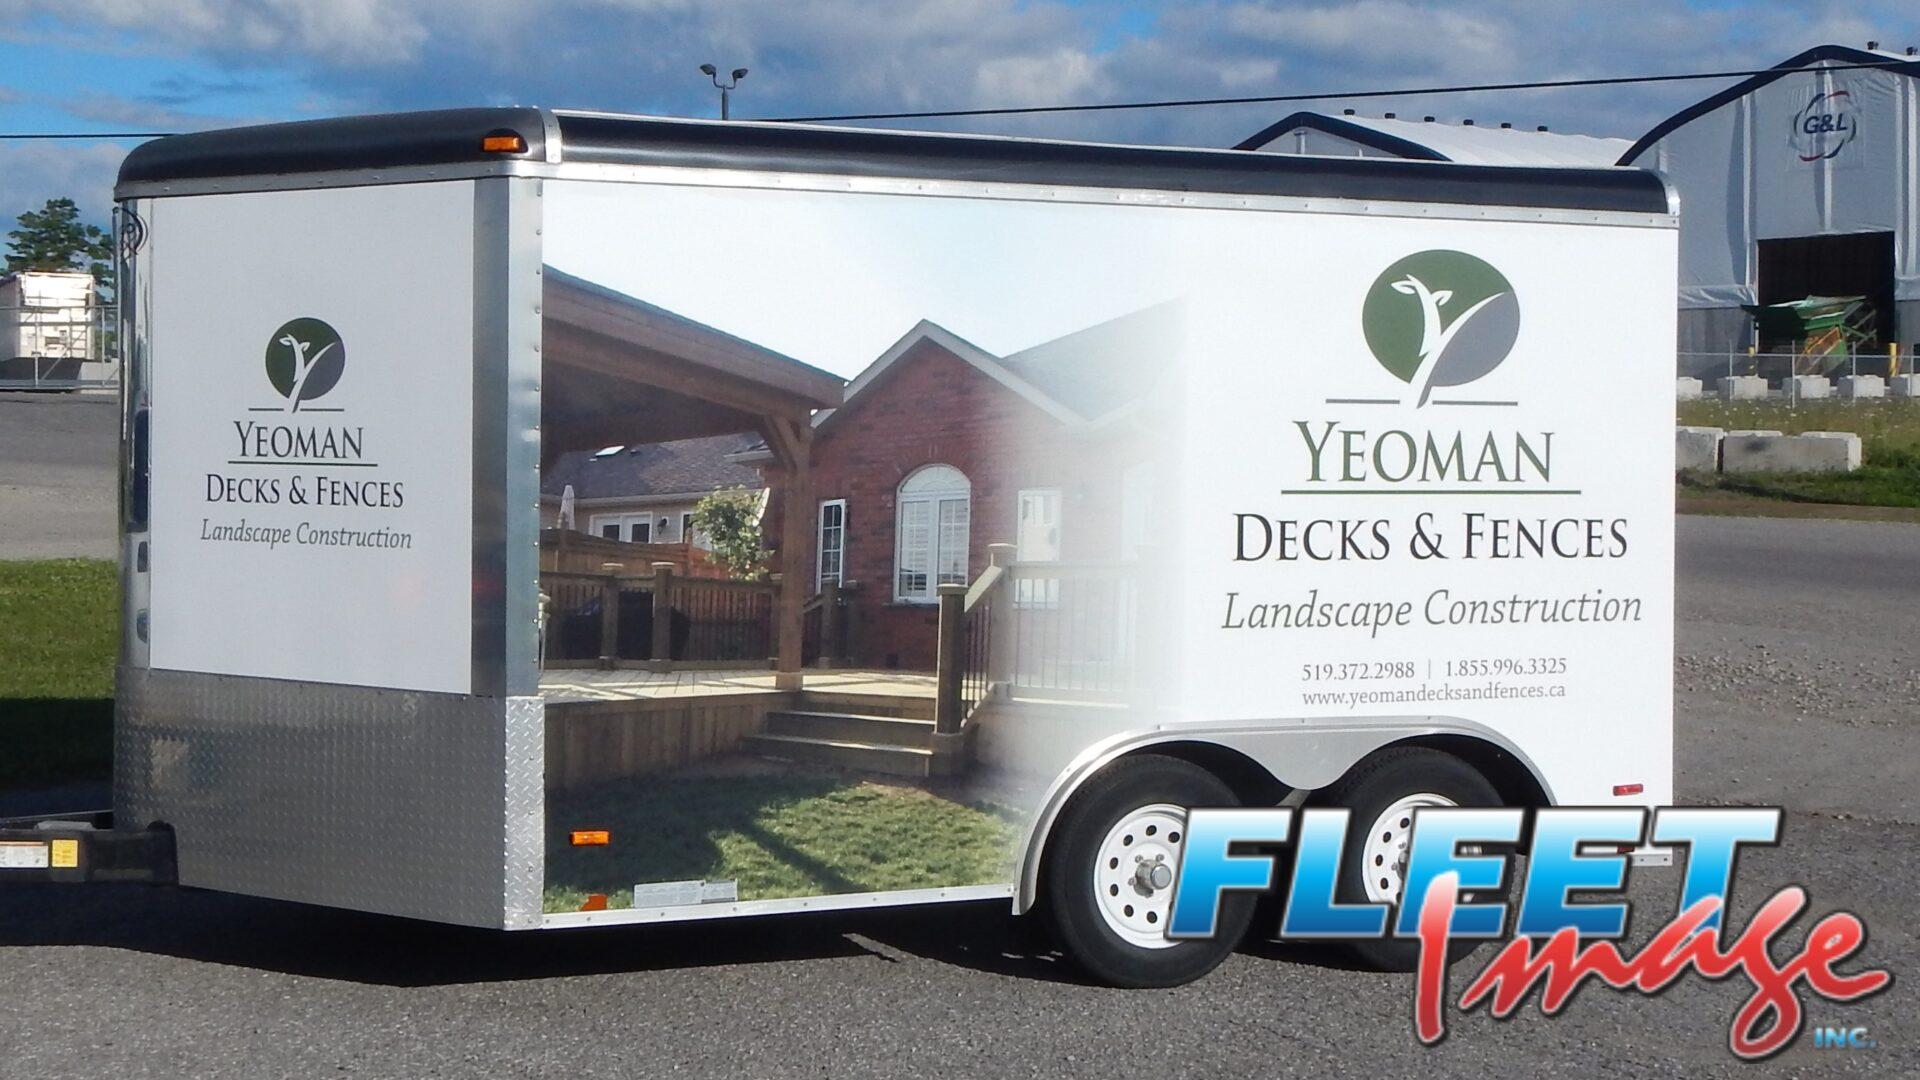 Yeoman Decks & Fences Landscape Construction decal sticker on a truck